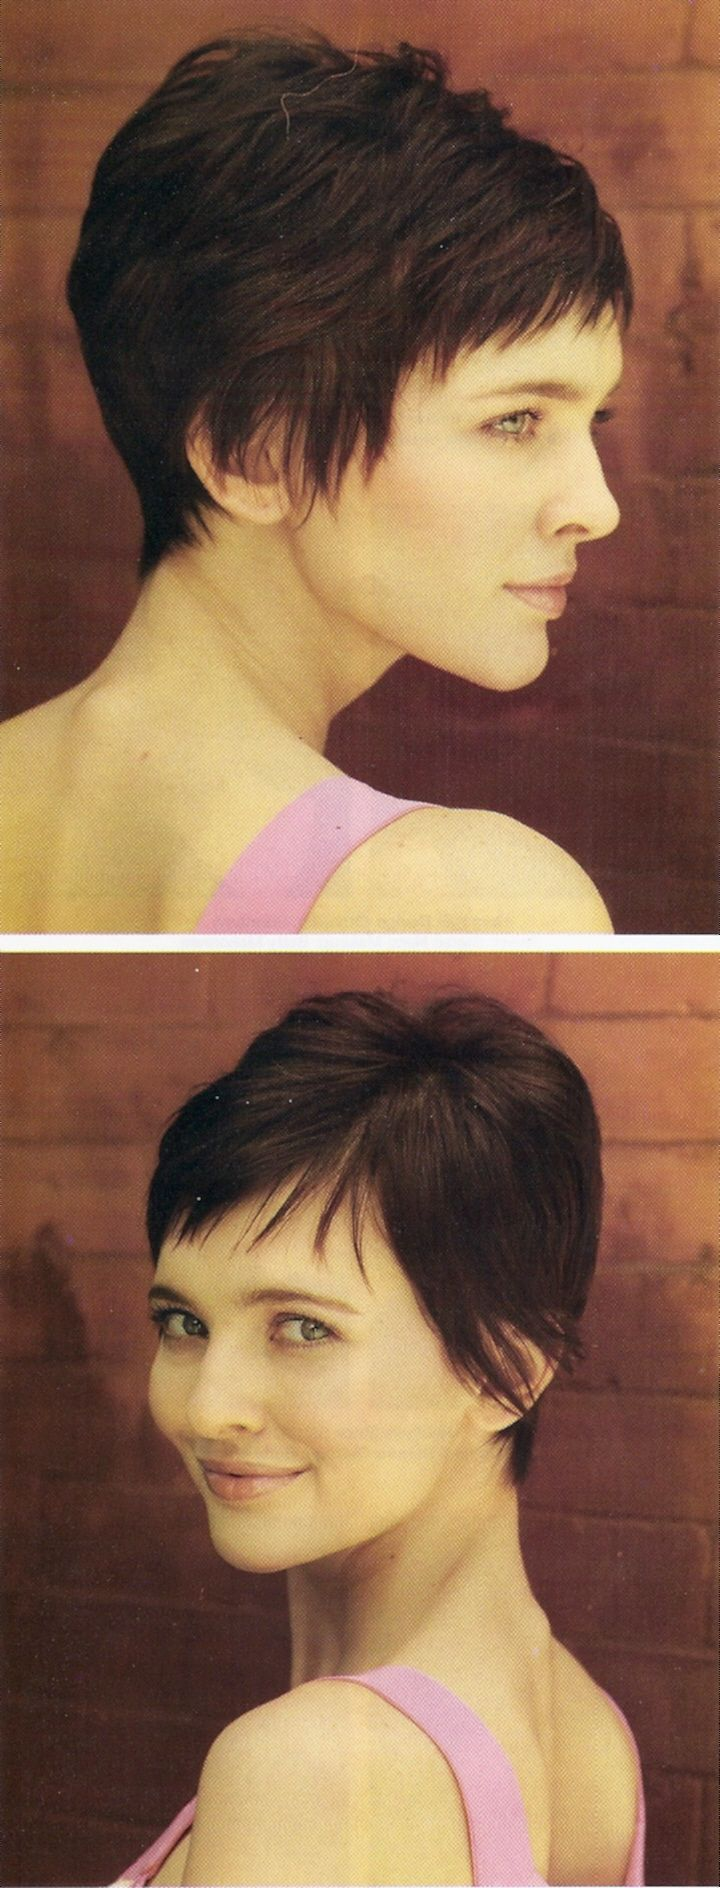 http://pixiehaircuts.net/wp-content/uploads/2012/05/Pixie-Haircuts0006.jpg